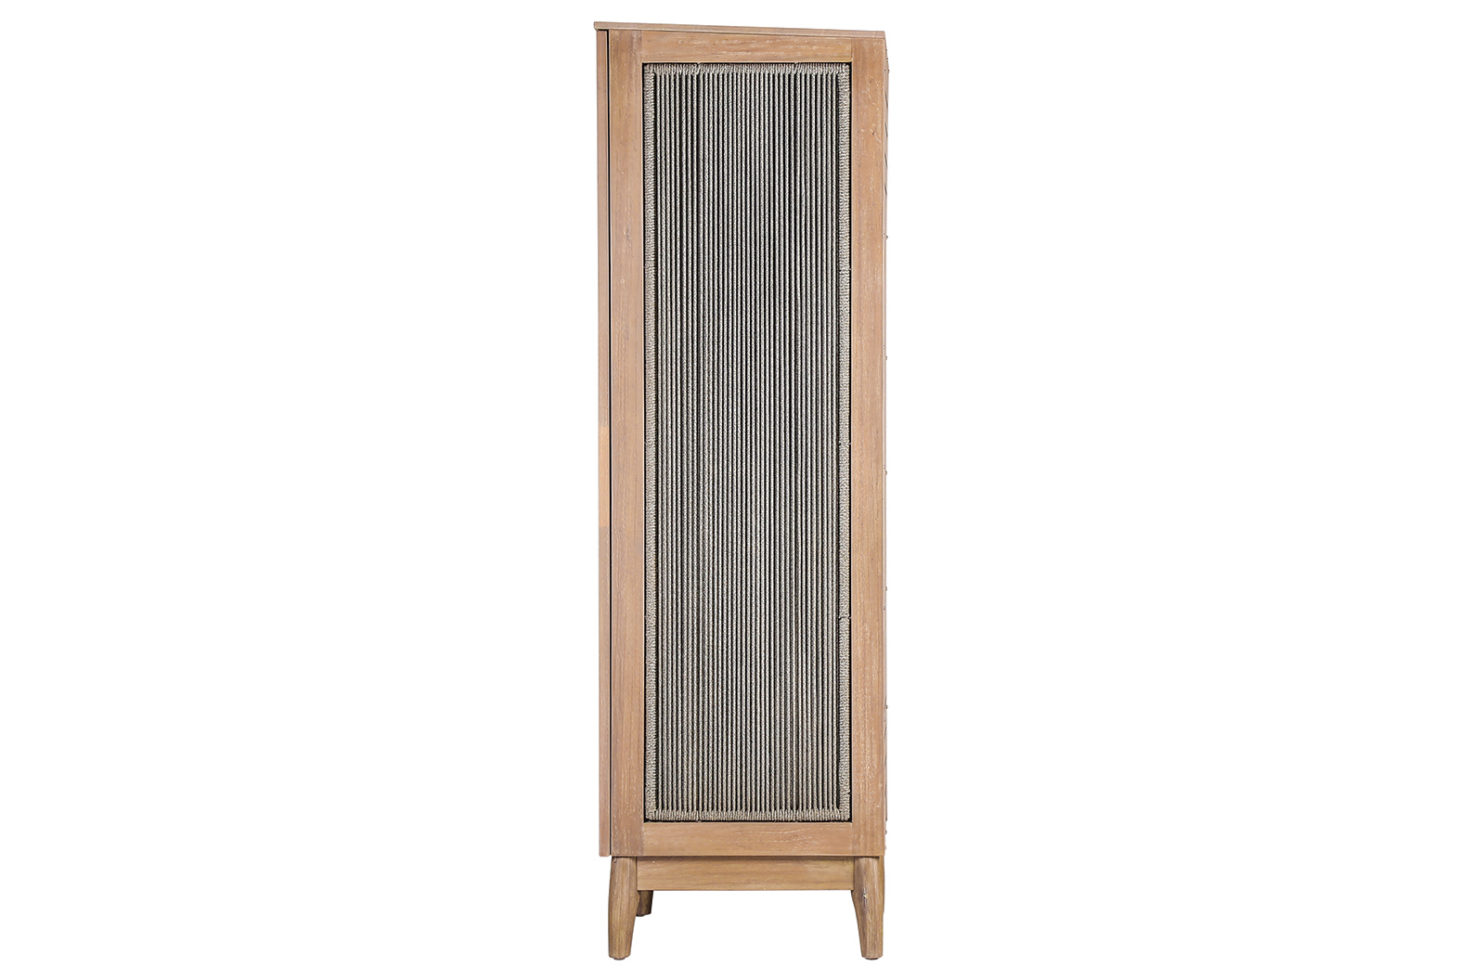 wings cabinet 504FT420P2G E 1 side